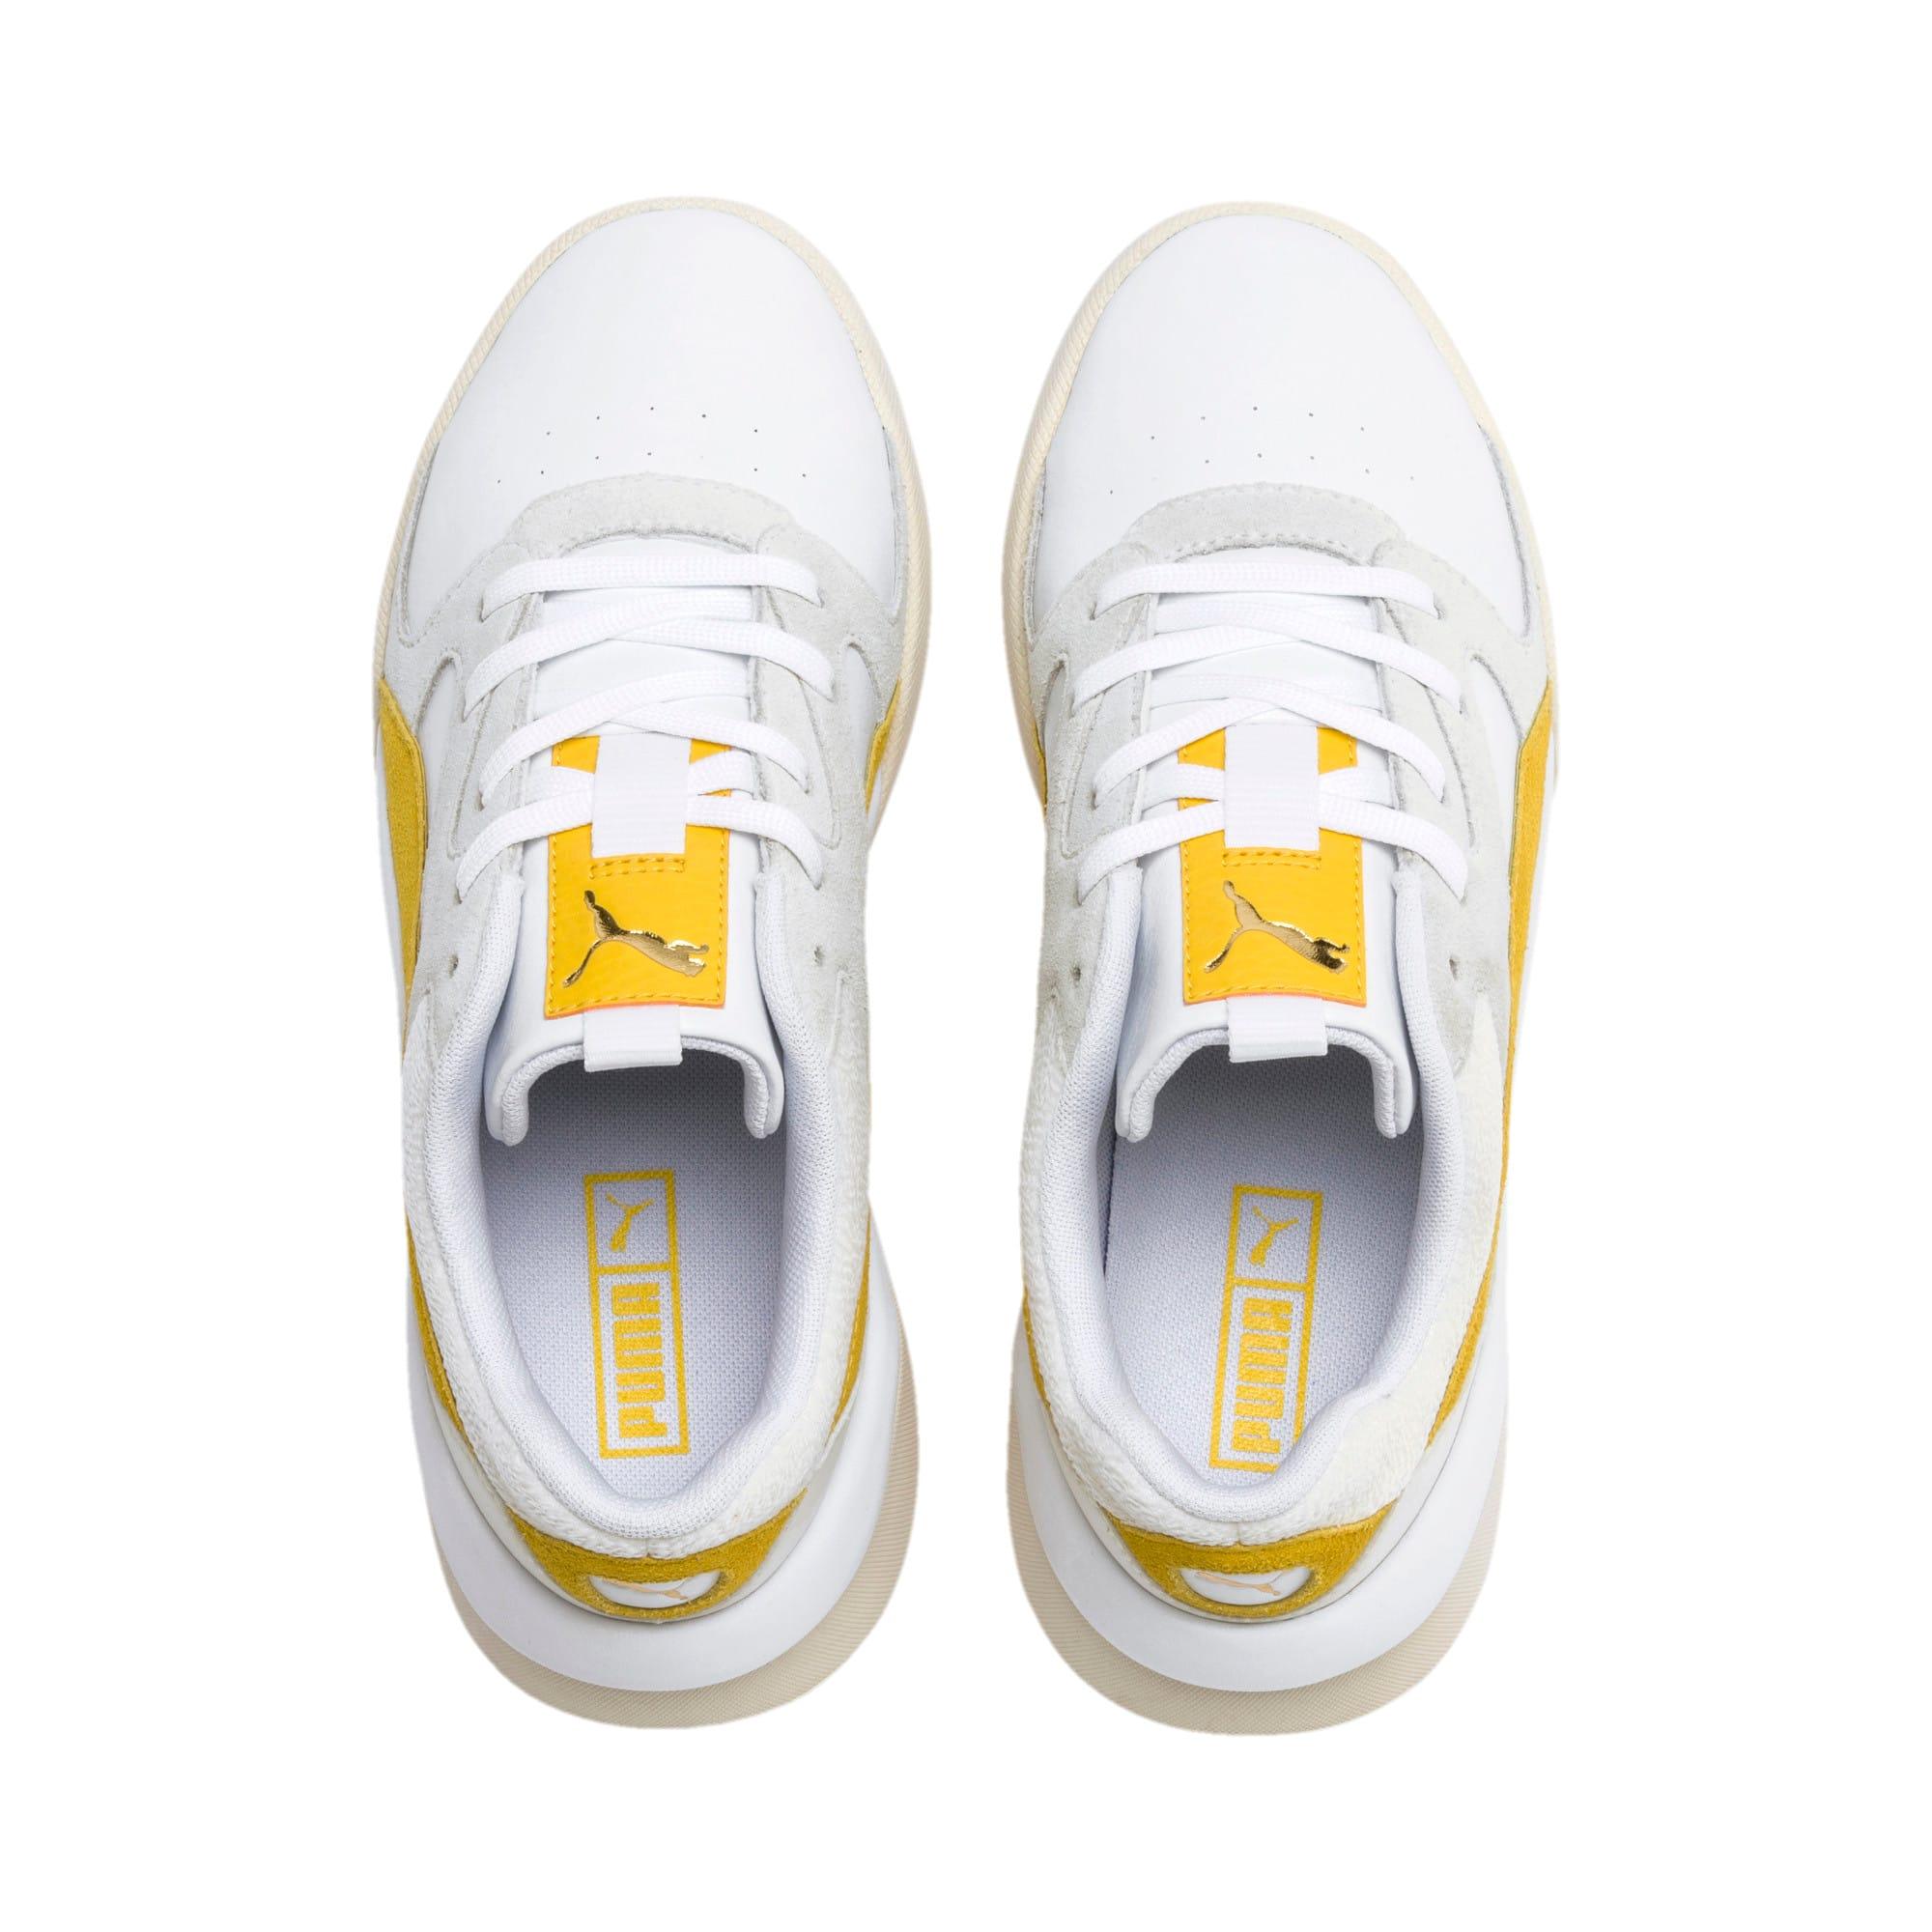 Thumbnail 7 of Aeon Heritage Women's Sneakers, Puma White-Sulphur, medium